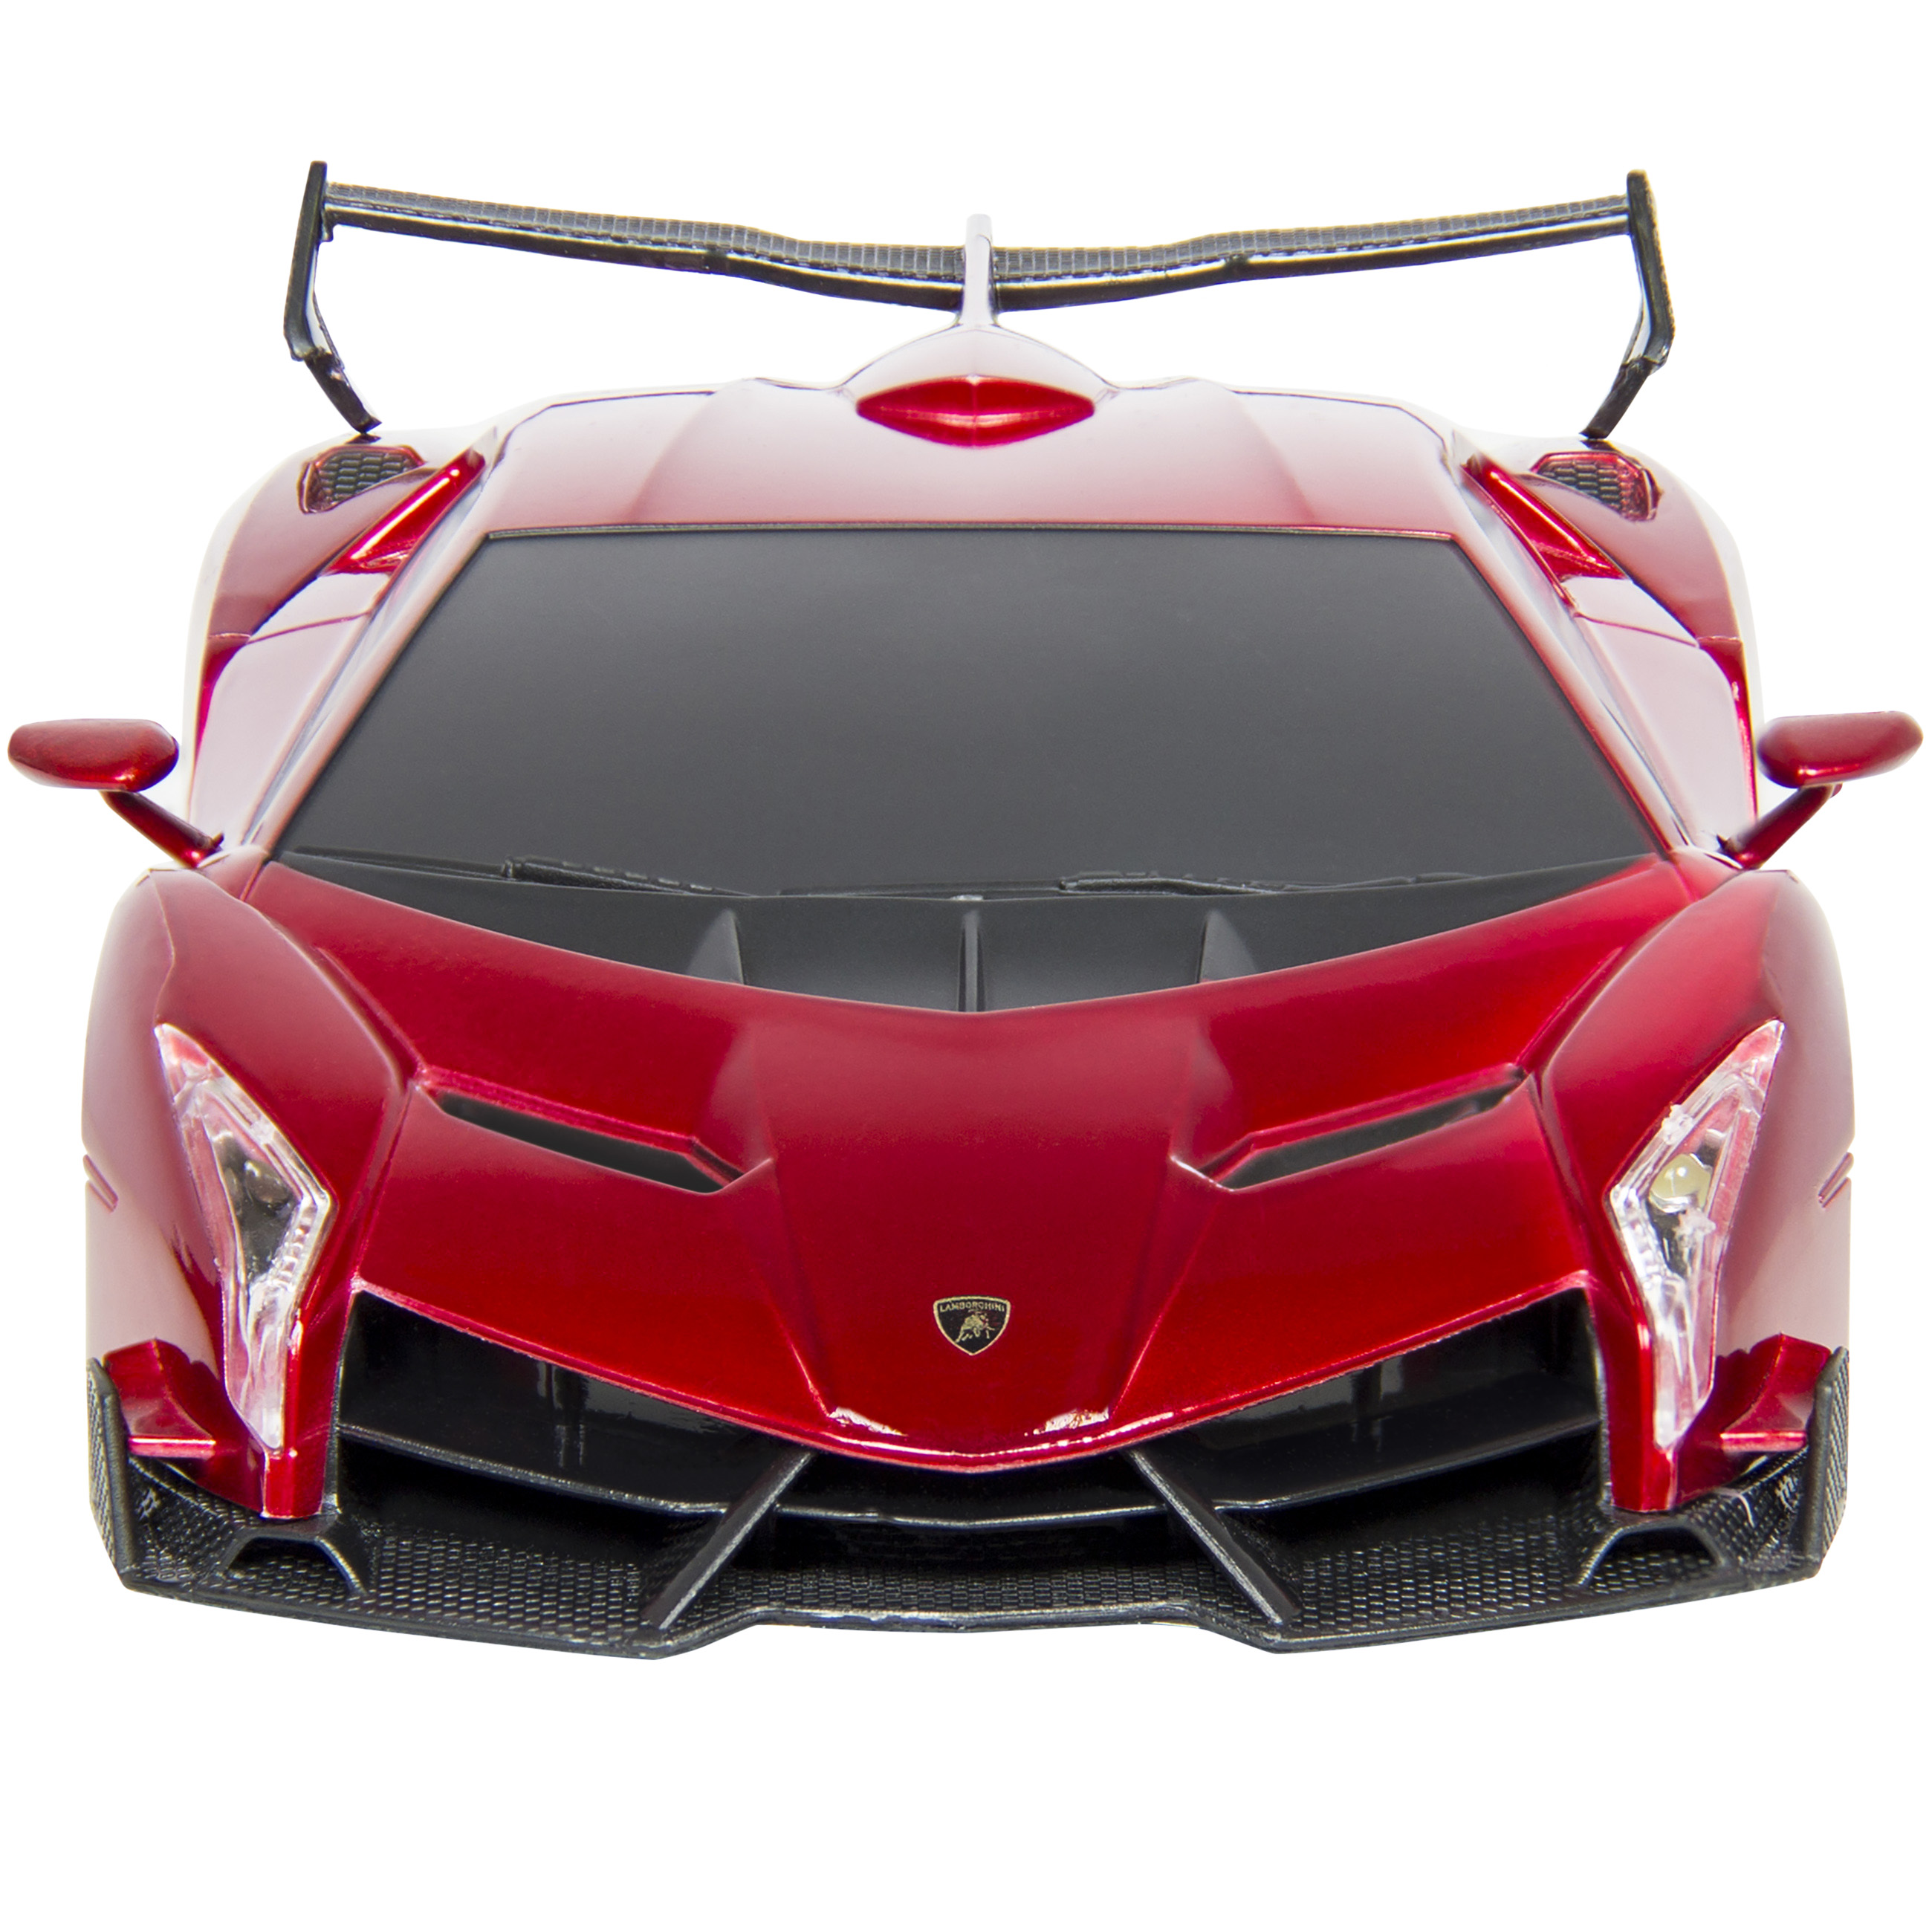 1/24 officially licensed rc lamborghini veneno sport racing car w